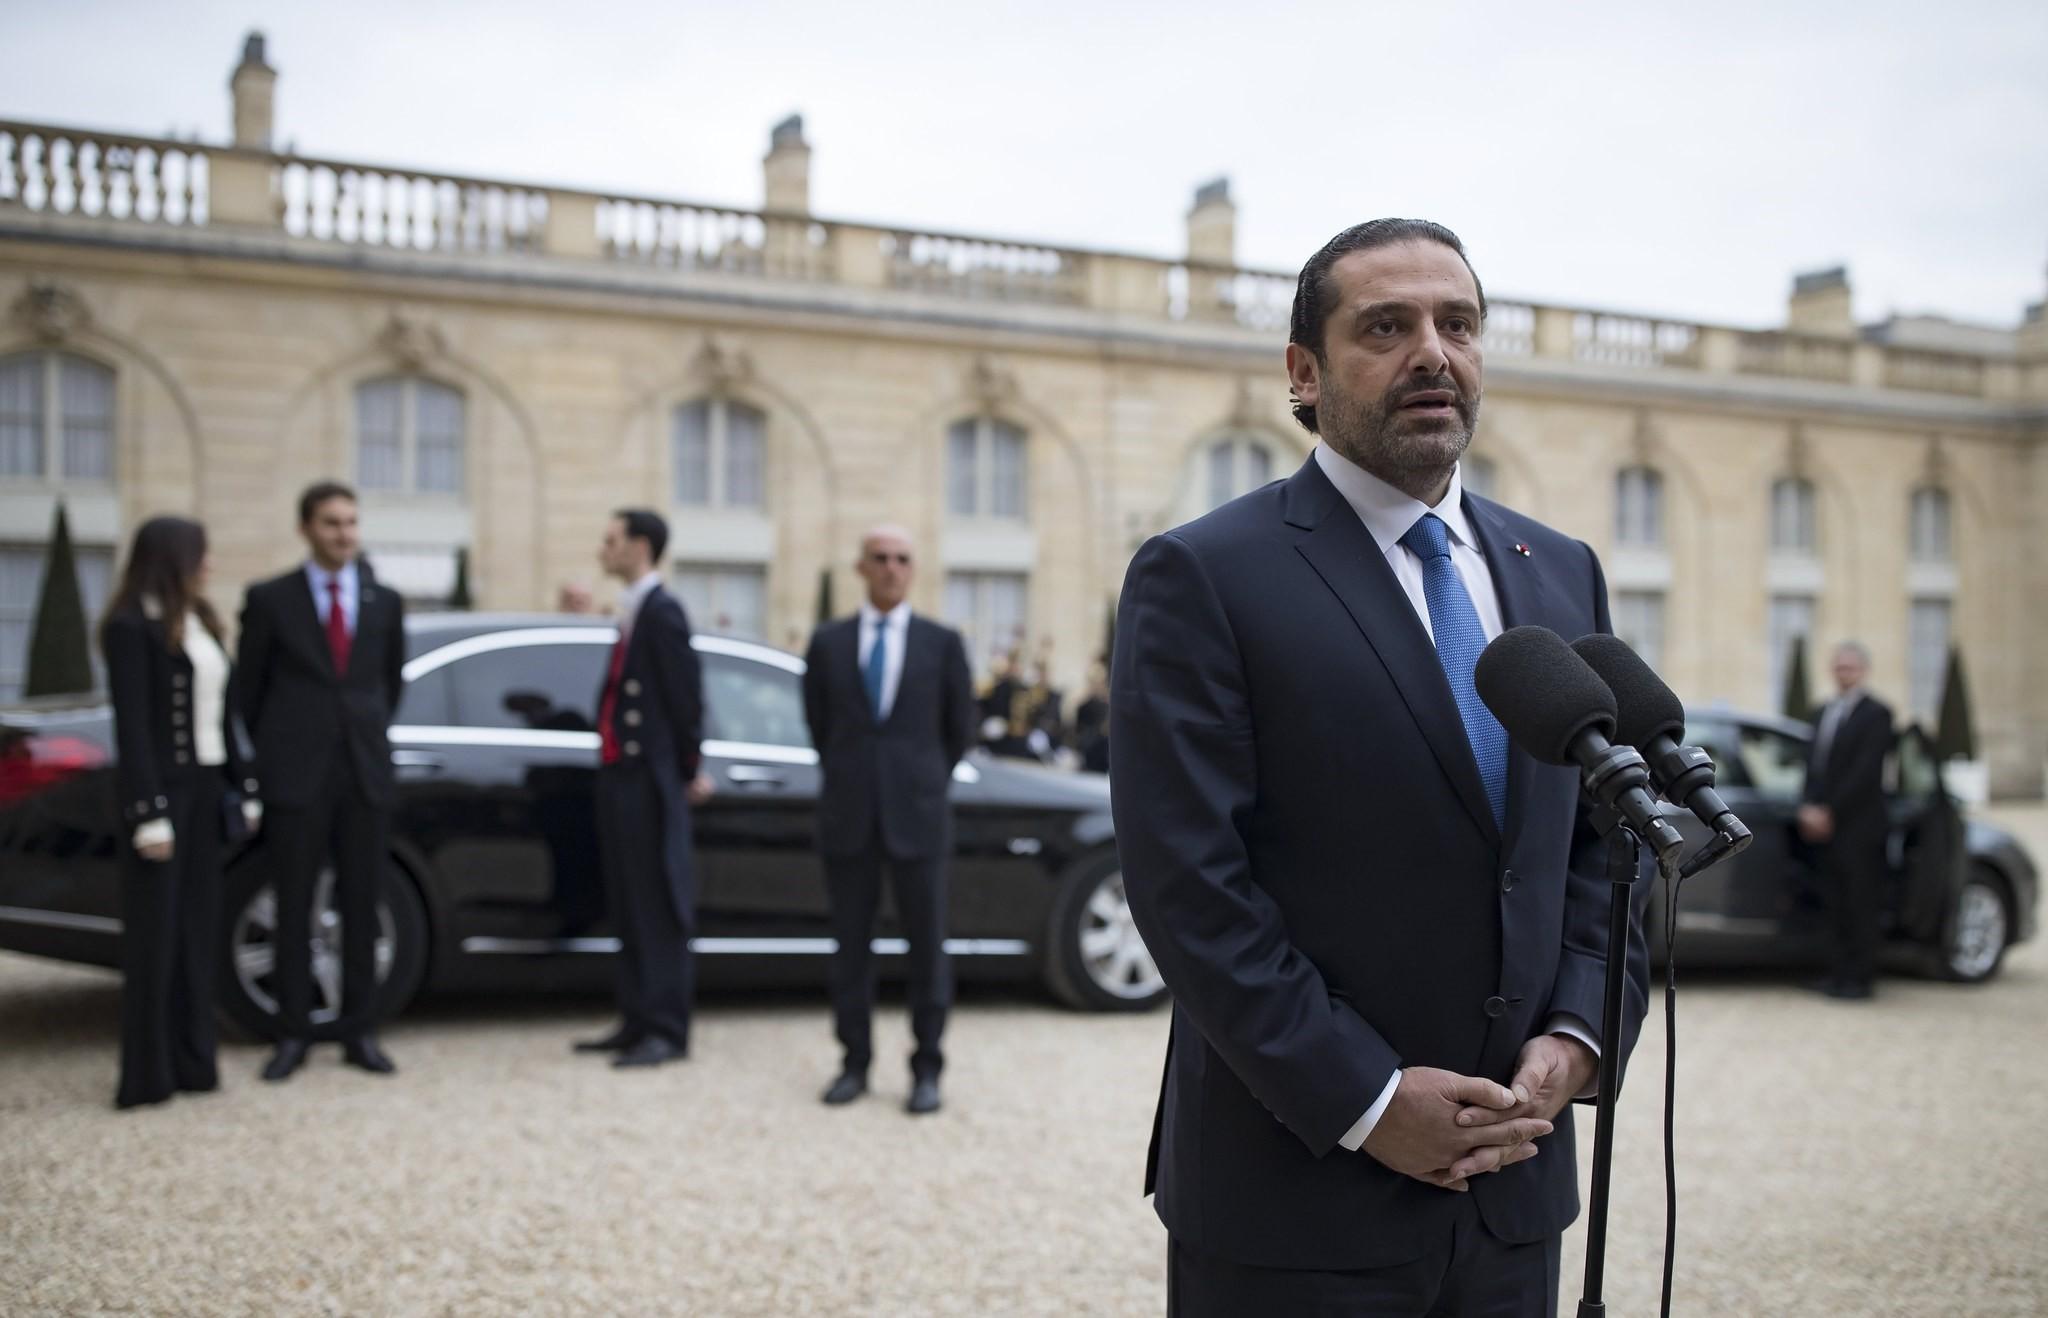 Lebanese Prime Minister Saad Hariri speaks to media after meeting French President Emmanuel Macron at the Elysee Palace in Paris, France, 18 November 2017. (EPA Photo)